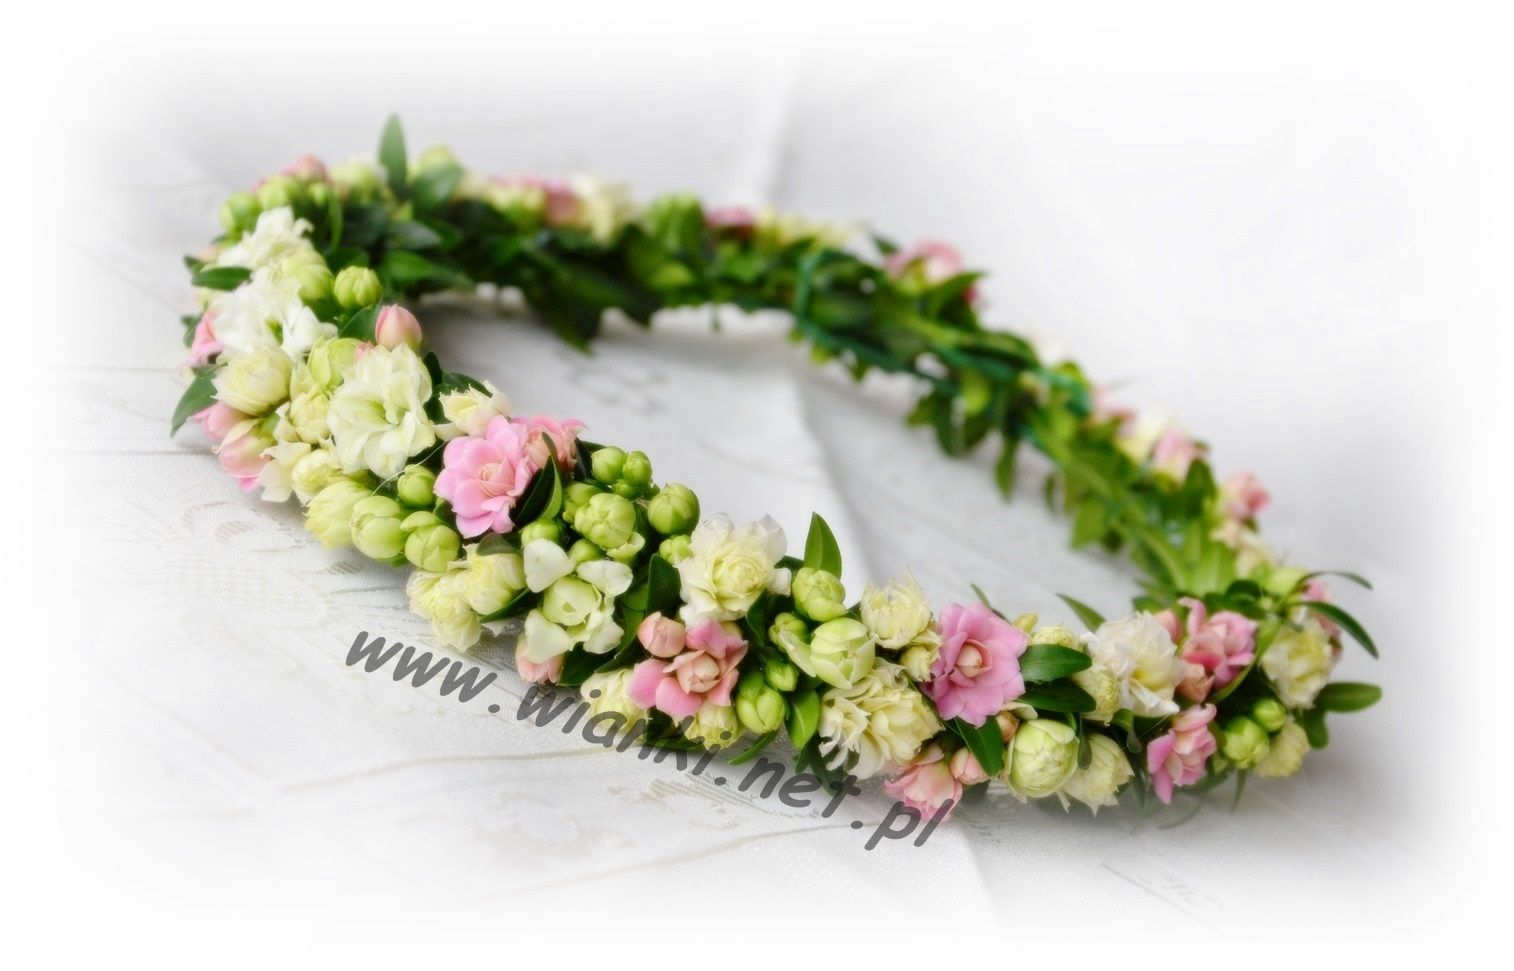 Wianki Komunijne Www Wianki Net Pl Flower Crown First Communion Hairstyles Wedding Bouquets